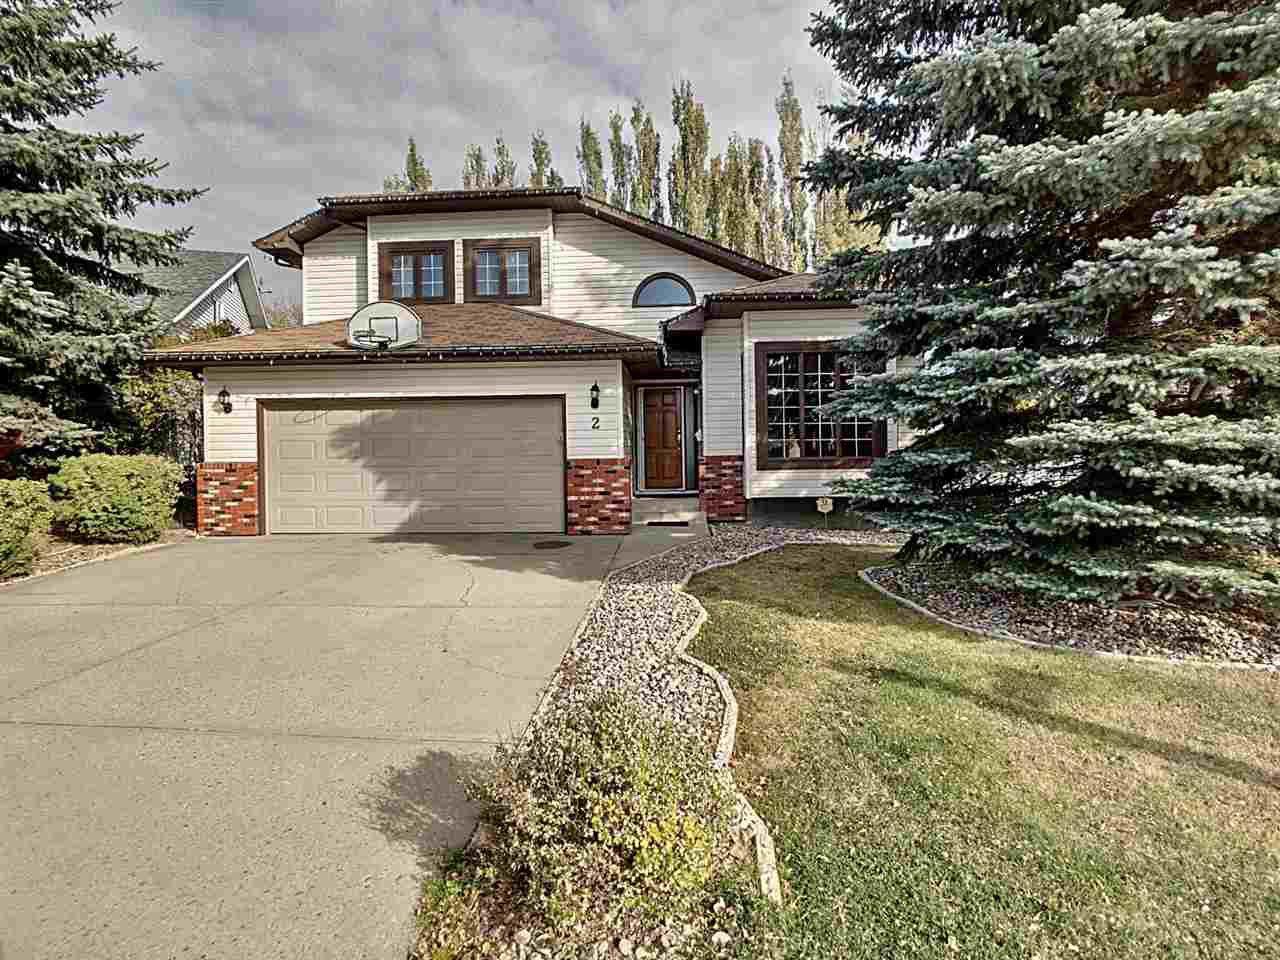 Main Photo: 2 CRAIGAVON Drive: Sherwood Park House for sale : MLS®# E4222358